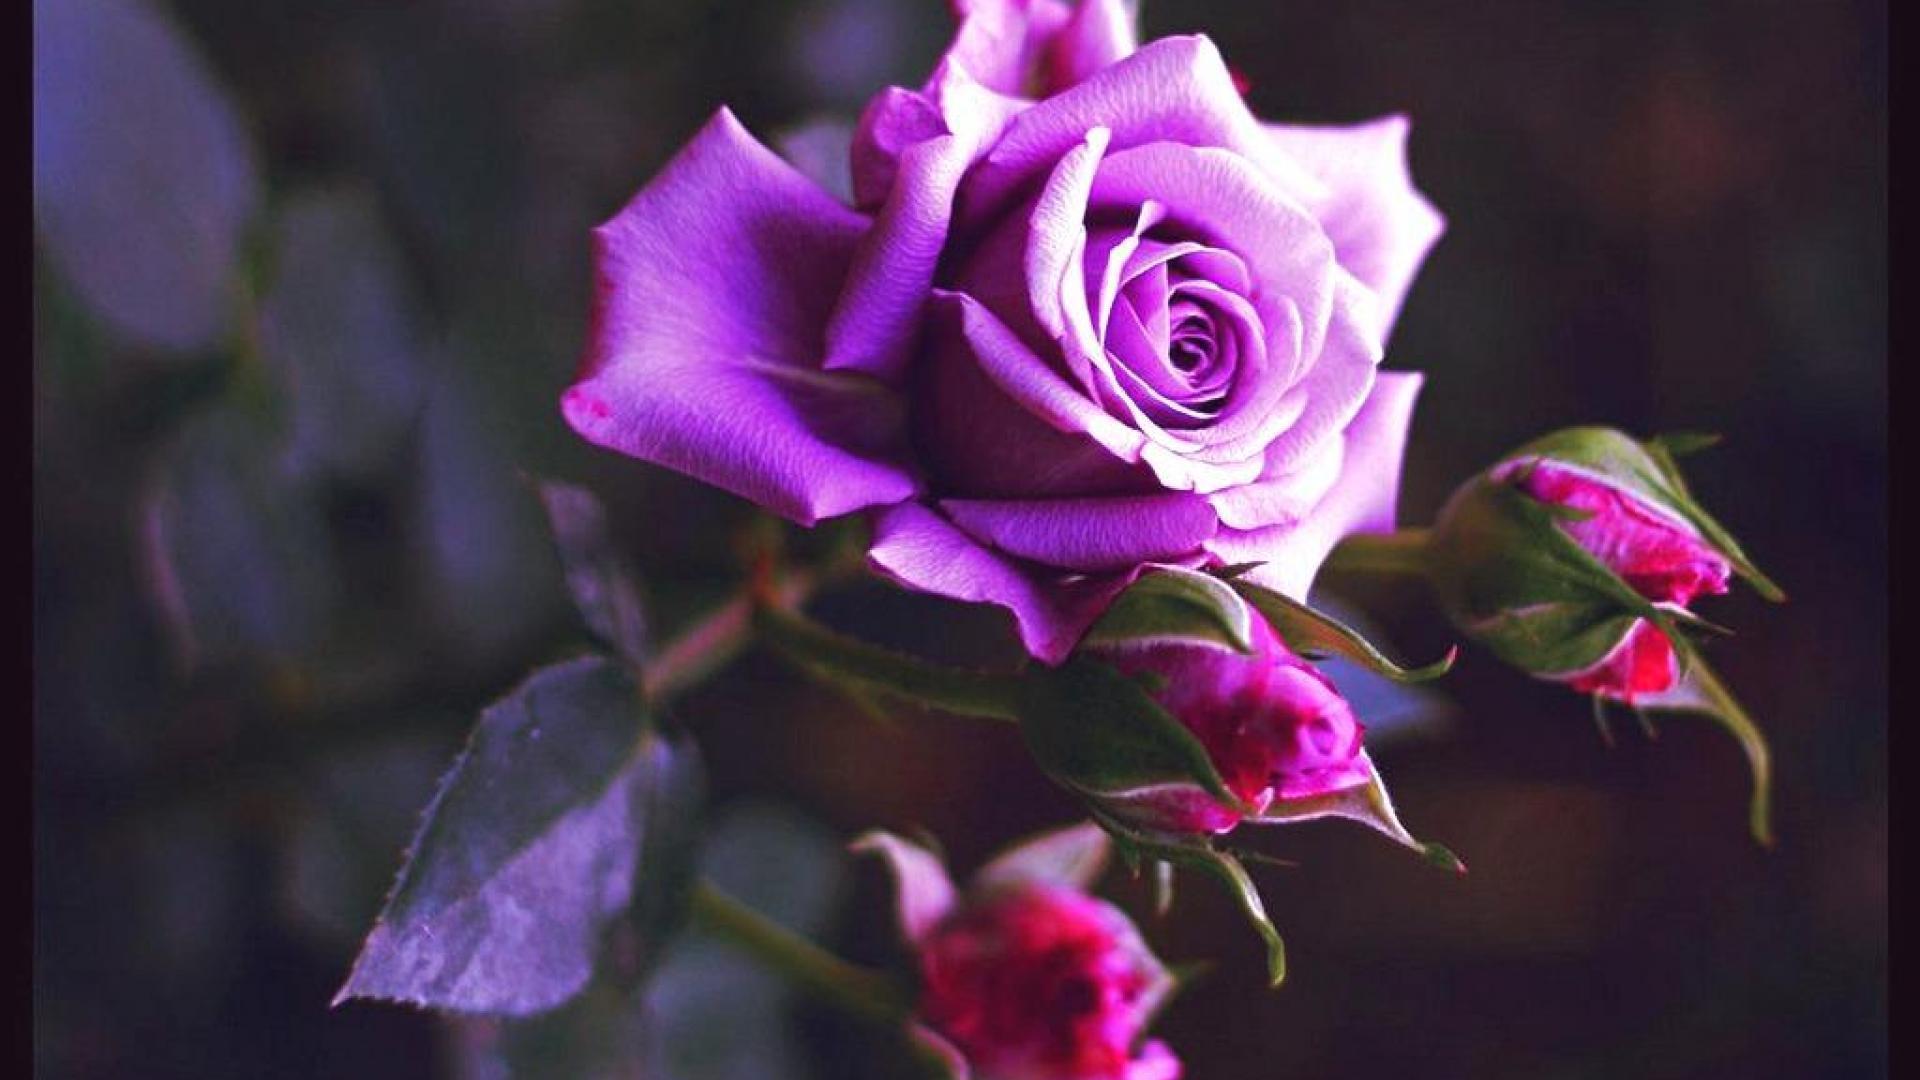 http://www.zastavki.com/pictures/originals/2014/Nature___Flowers_Purple_rose_blossomed_055835_.jpg